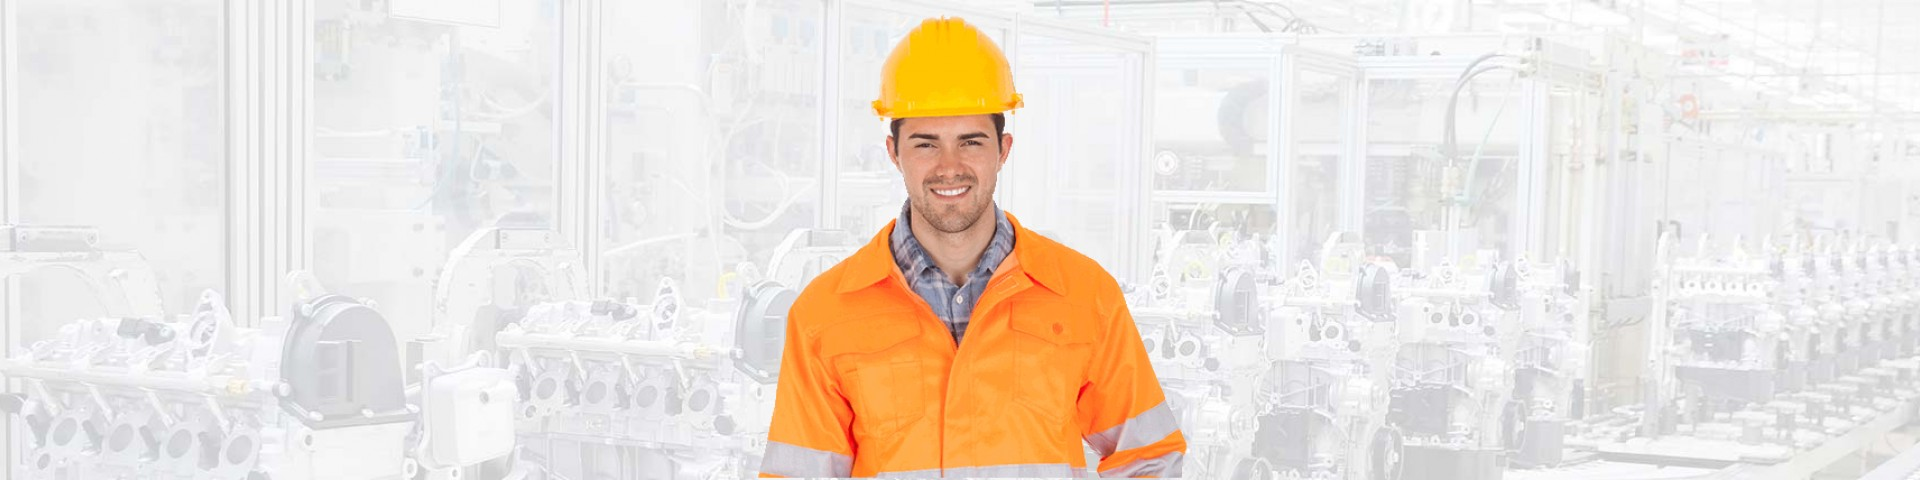 Heavy Equipment Mechanician